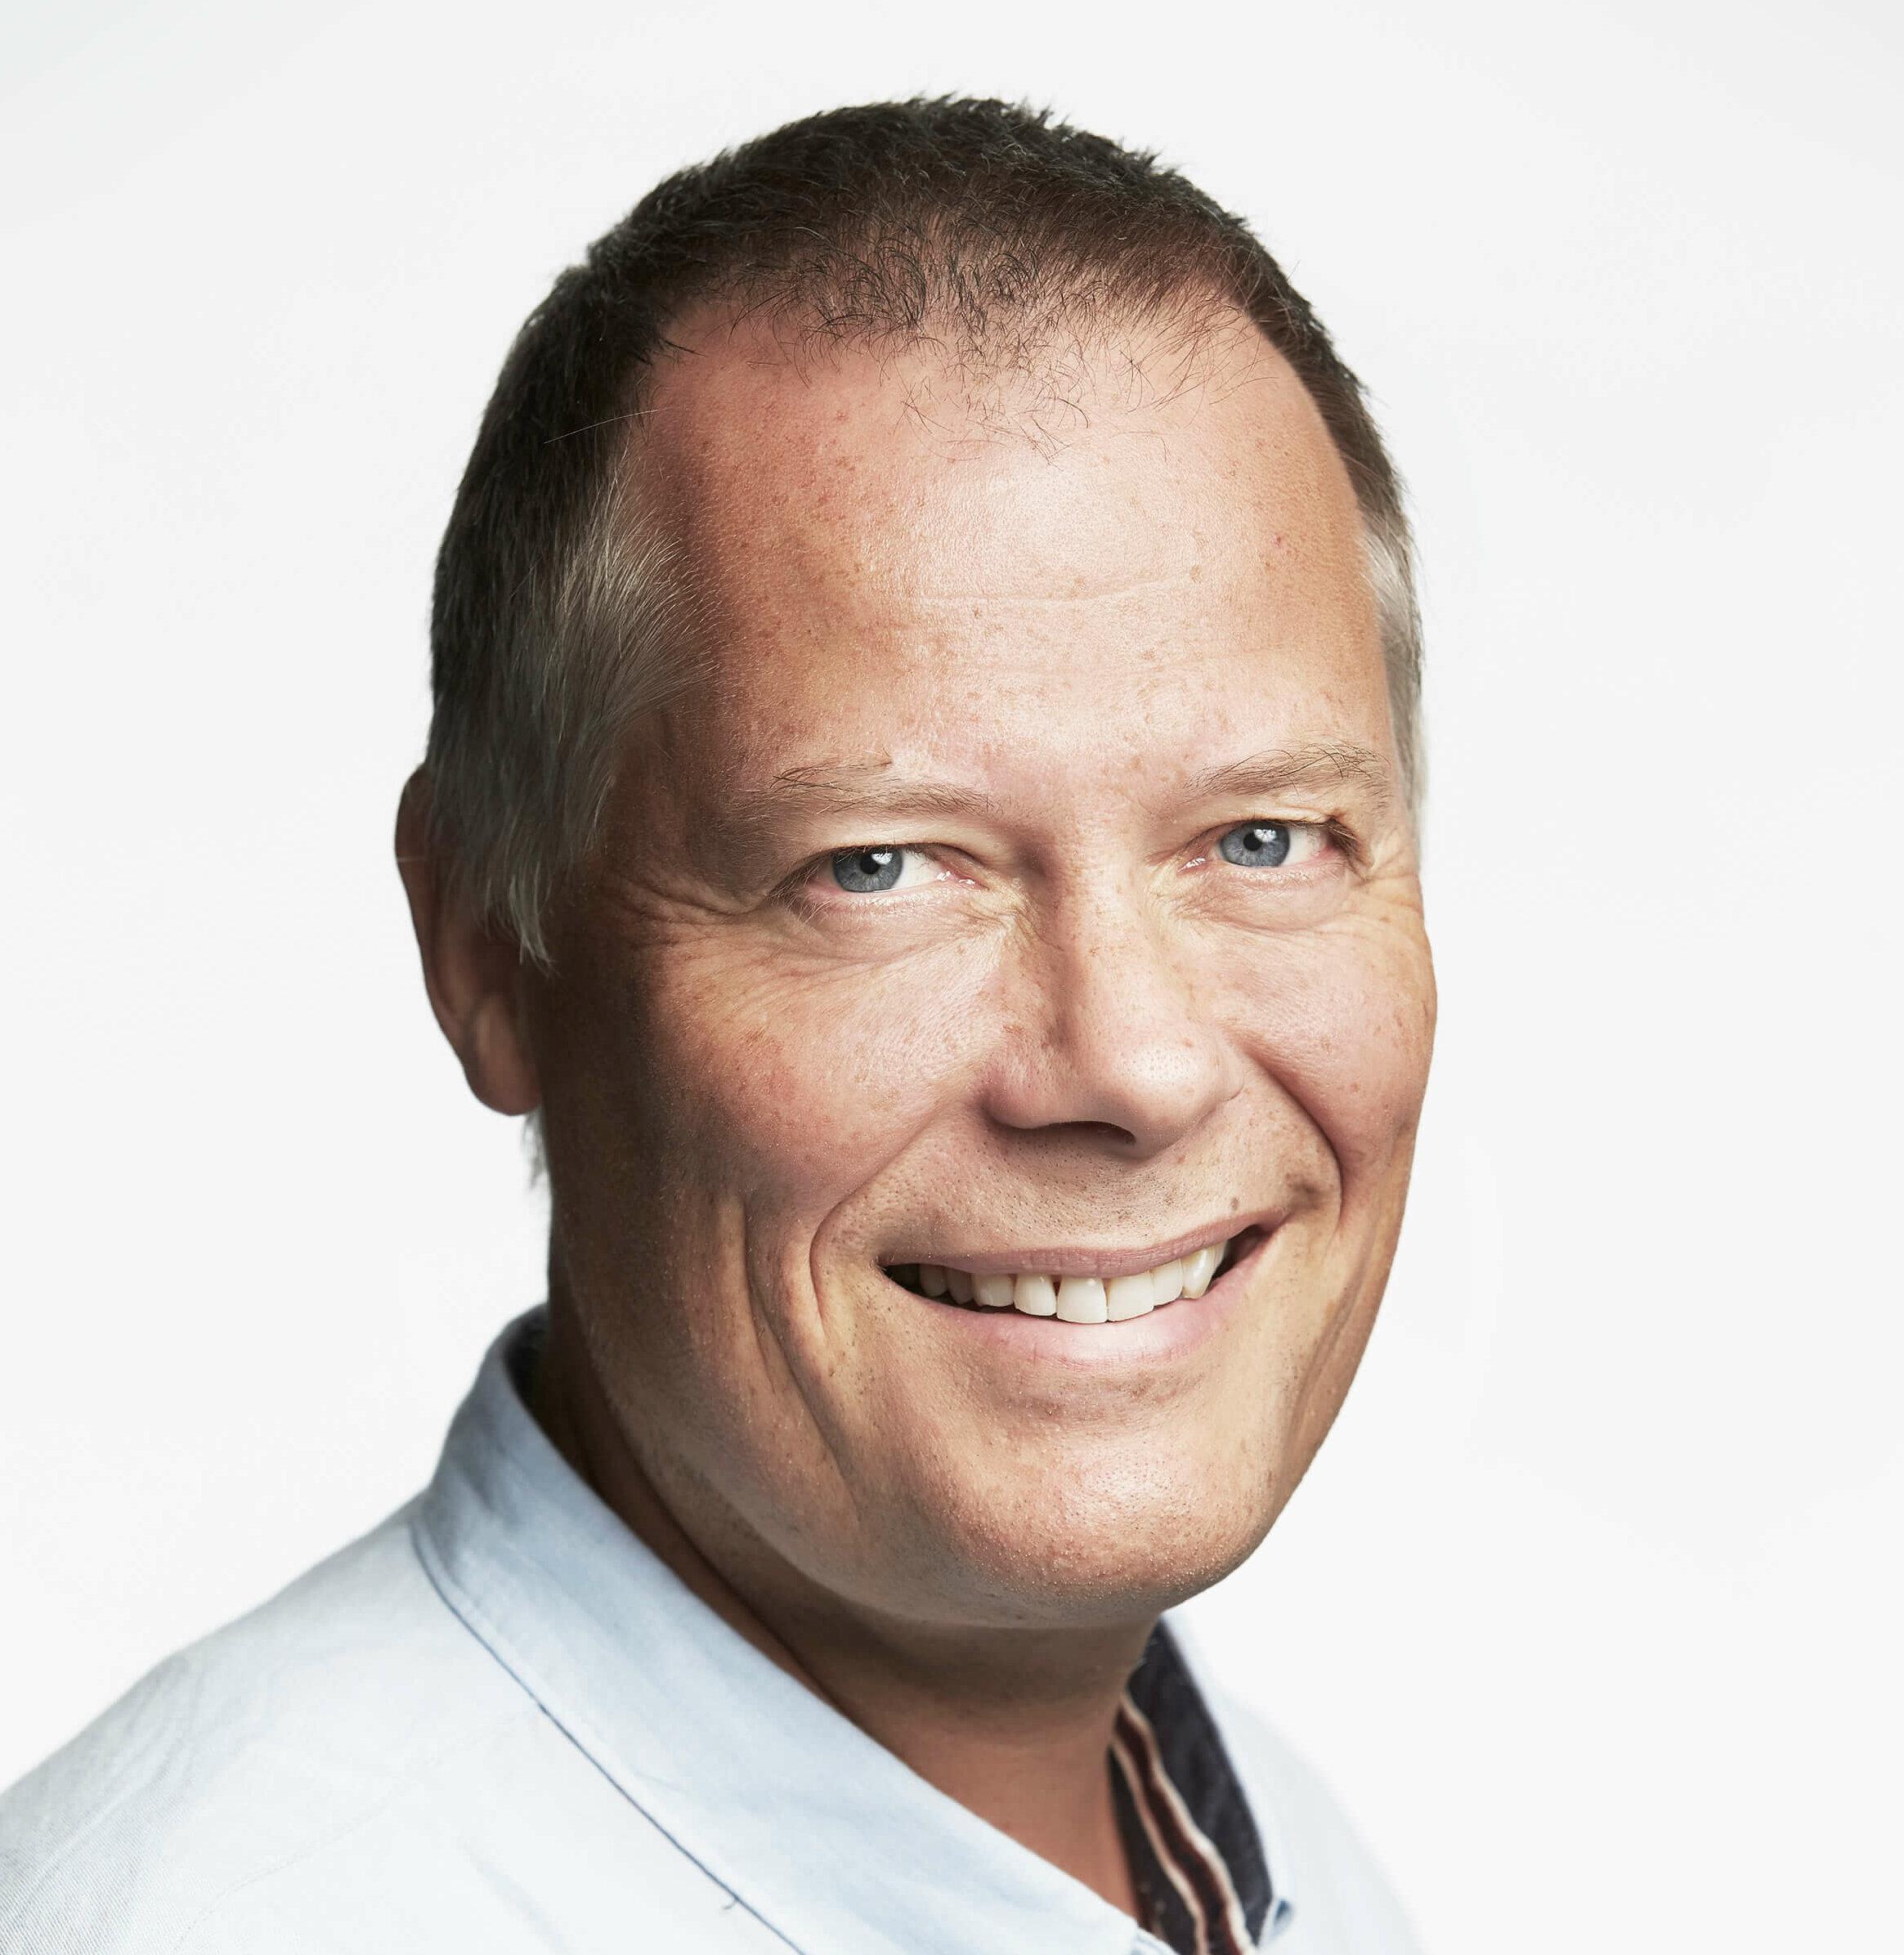 Ny ansat: Torsten Borbye Nielsen